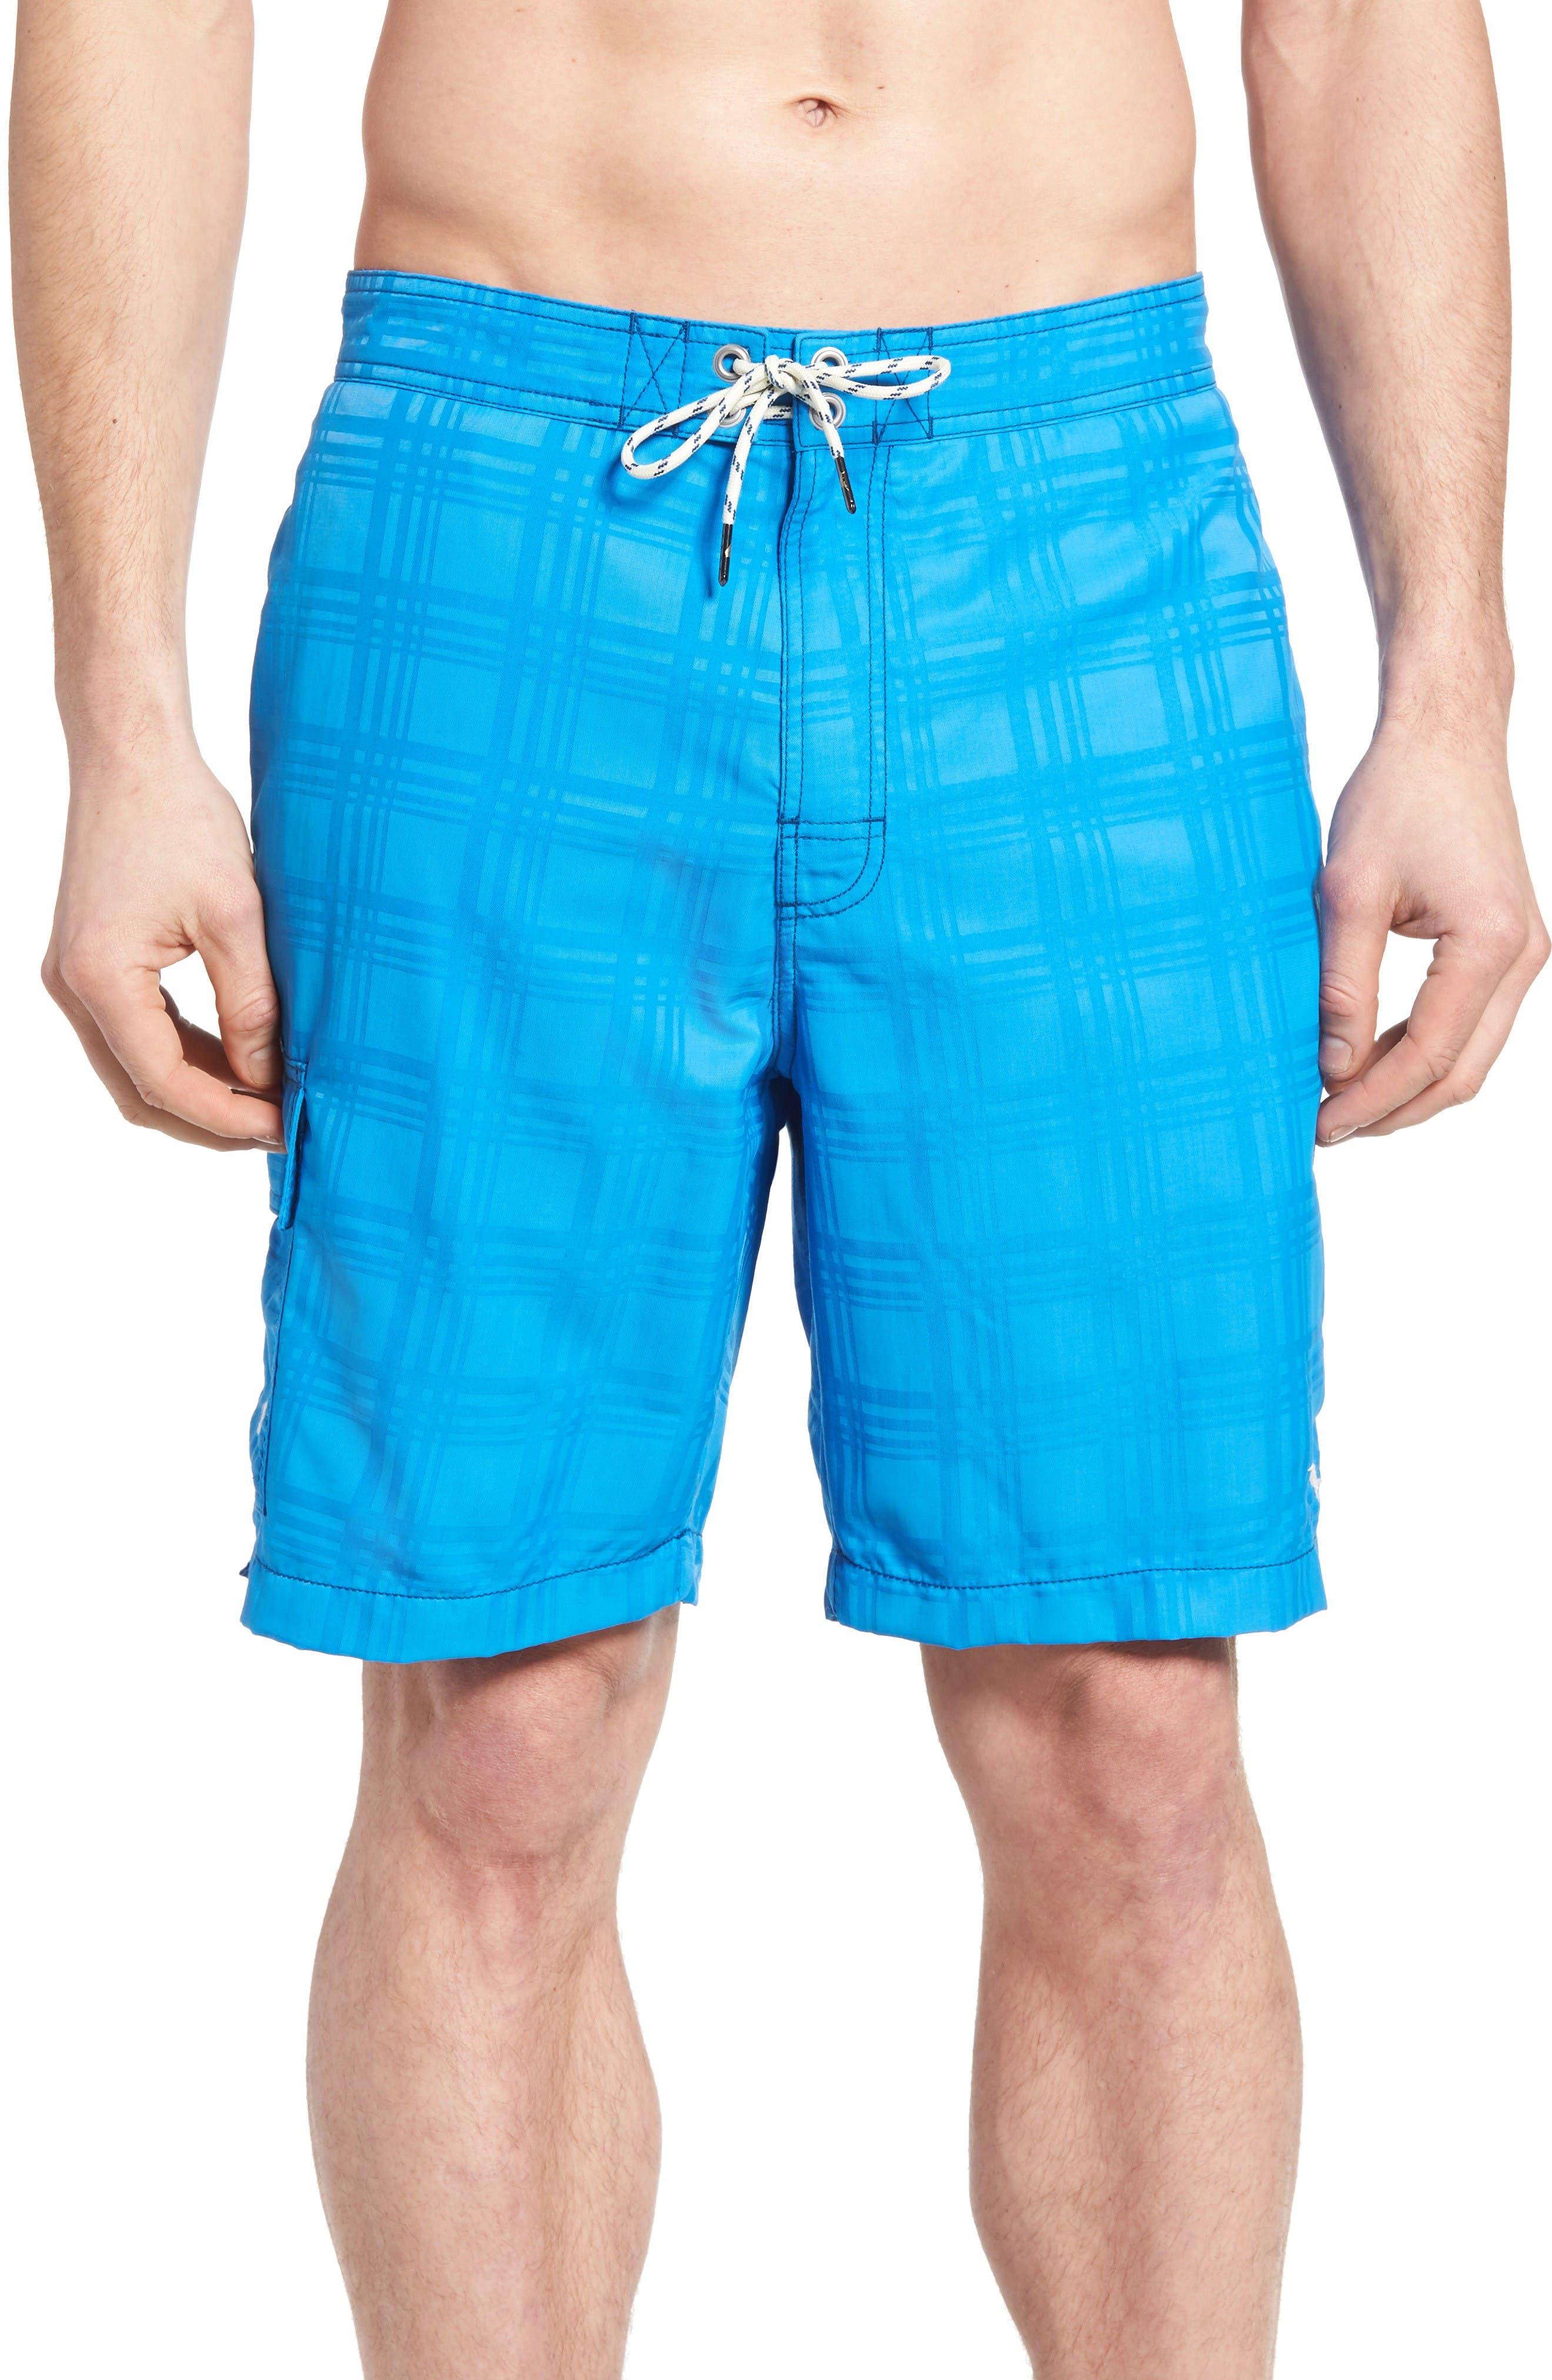 Alternate Image 1 Selected - Tommy Bahama Baja Plaid Swim Trunks